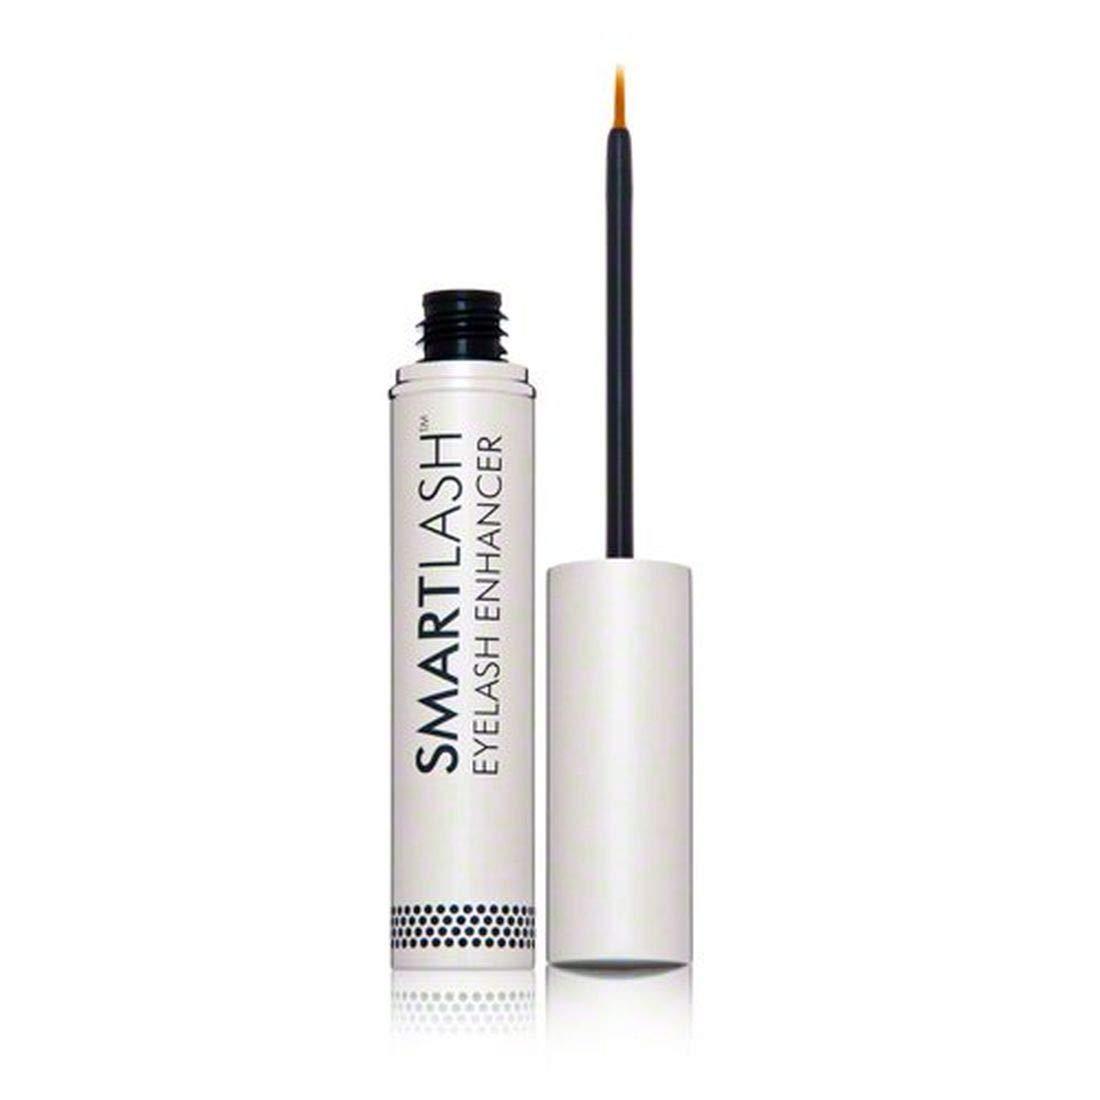 SmartLash Eyelash Enhancer Sacramento Mall 0.16 oz. Popular popular